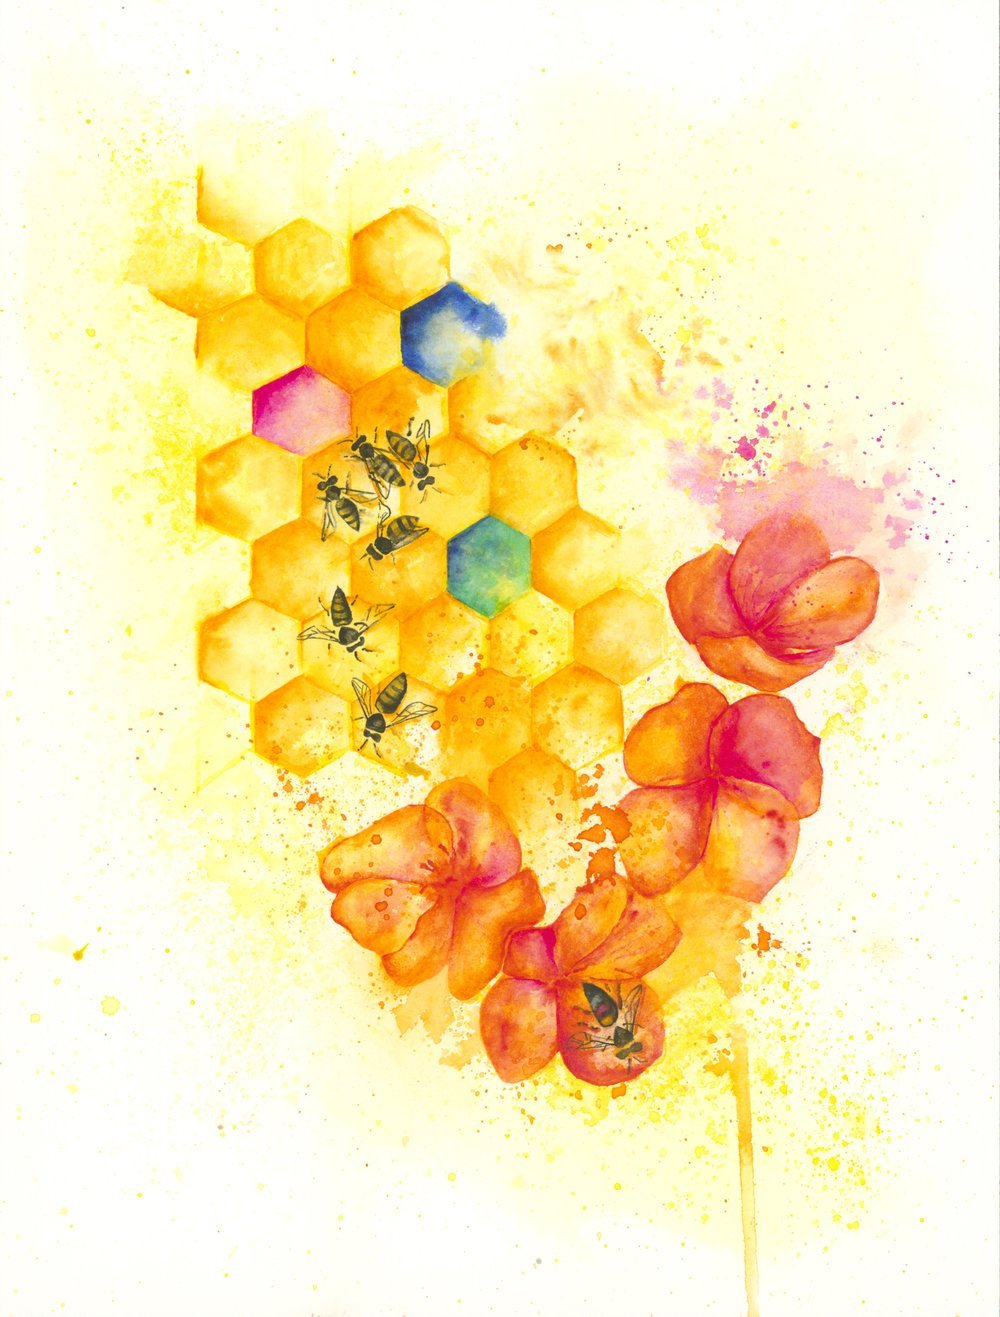 bees and honeycomb adj jpeg.jpg